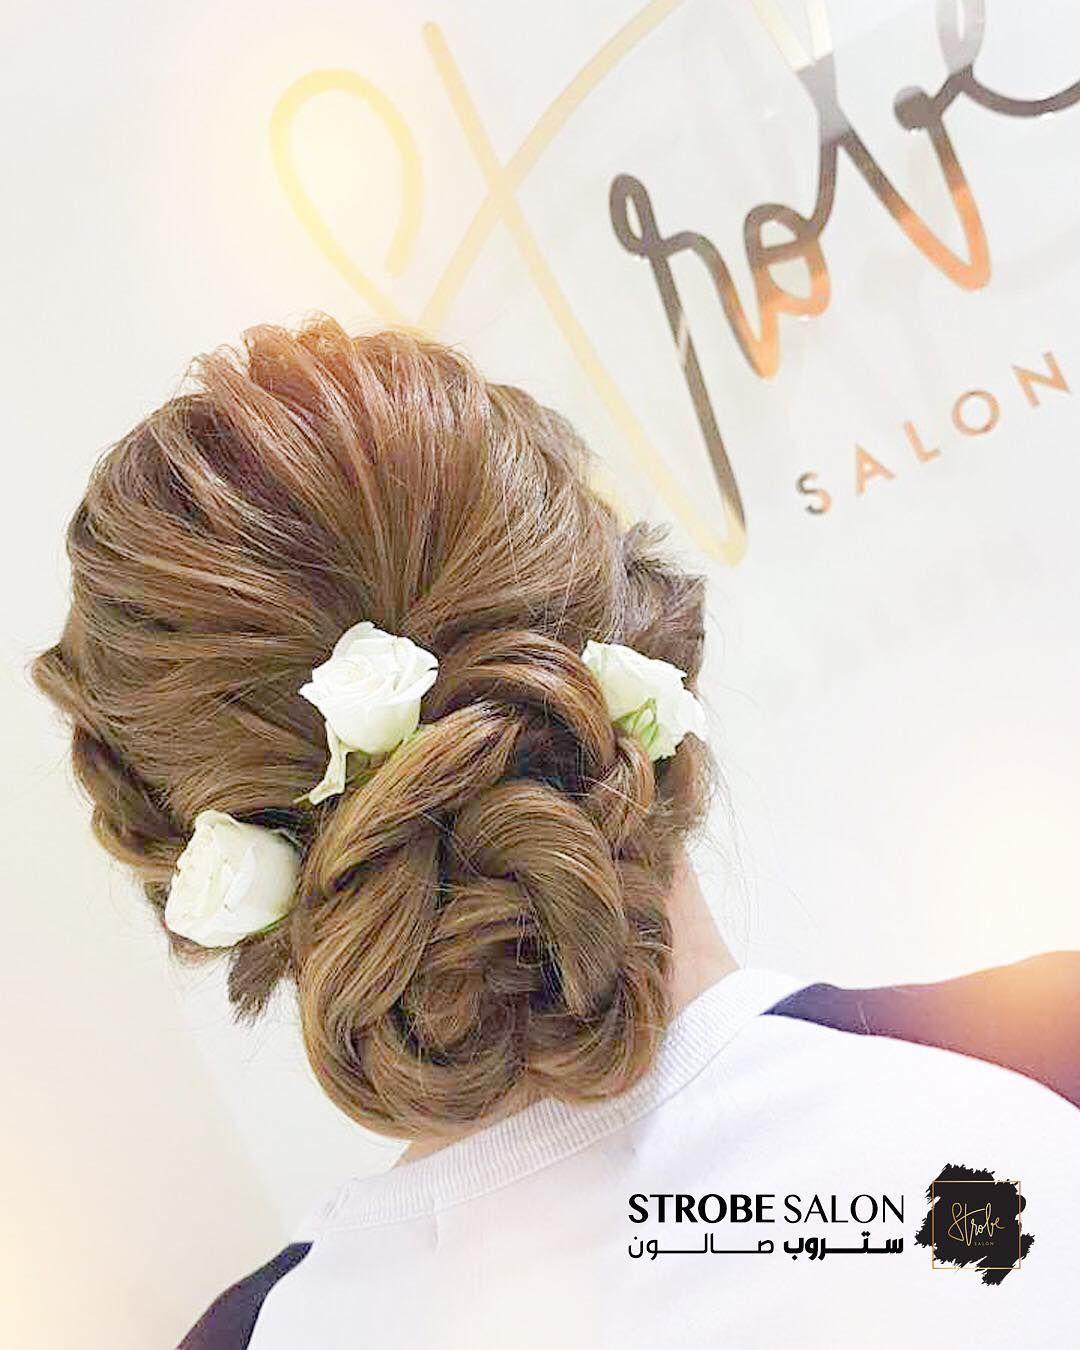 New The 10 Best Hairstyles With Pictures Hairstyle Salon Salonkw Strobesalon Kuwait Newkuwait Kuwaitoffers Hair Styles Cool Hairstyles Hair Today